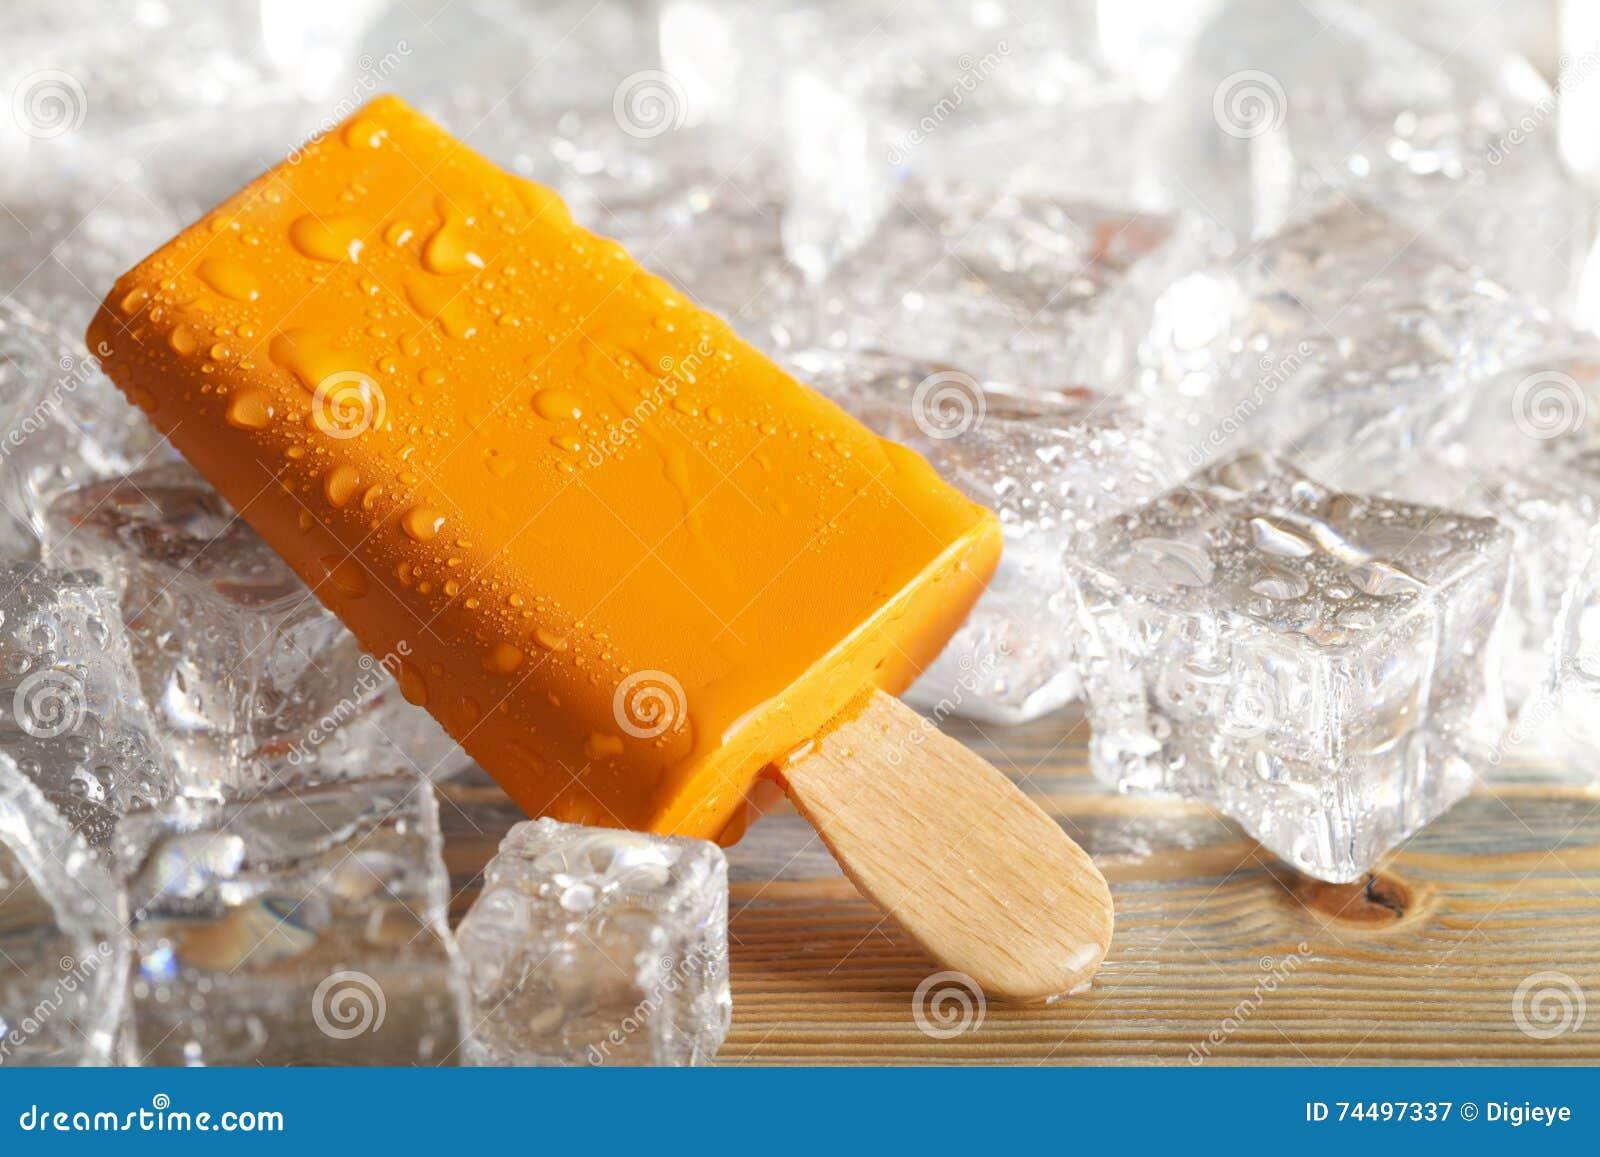 Ijslollie op ijsblokjes